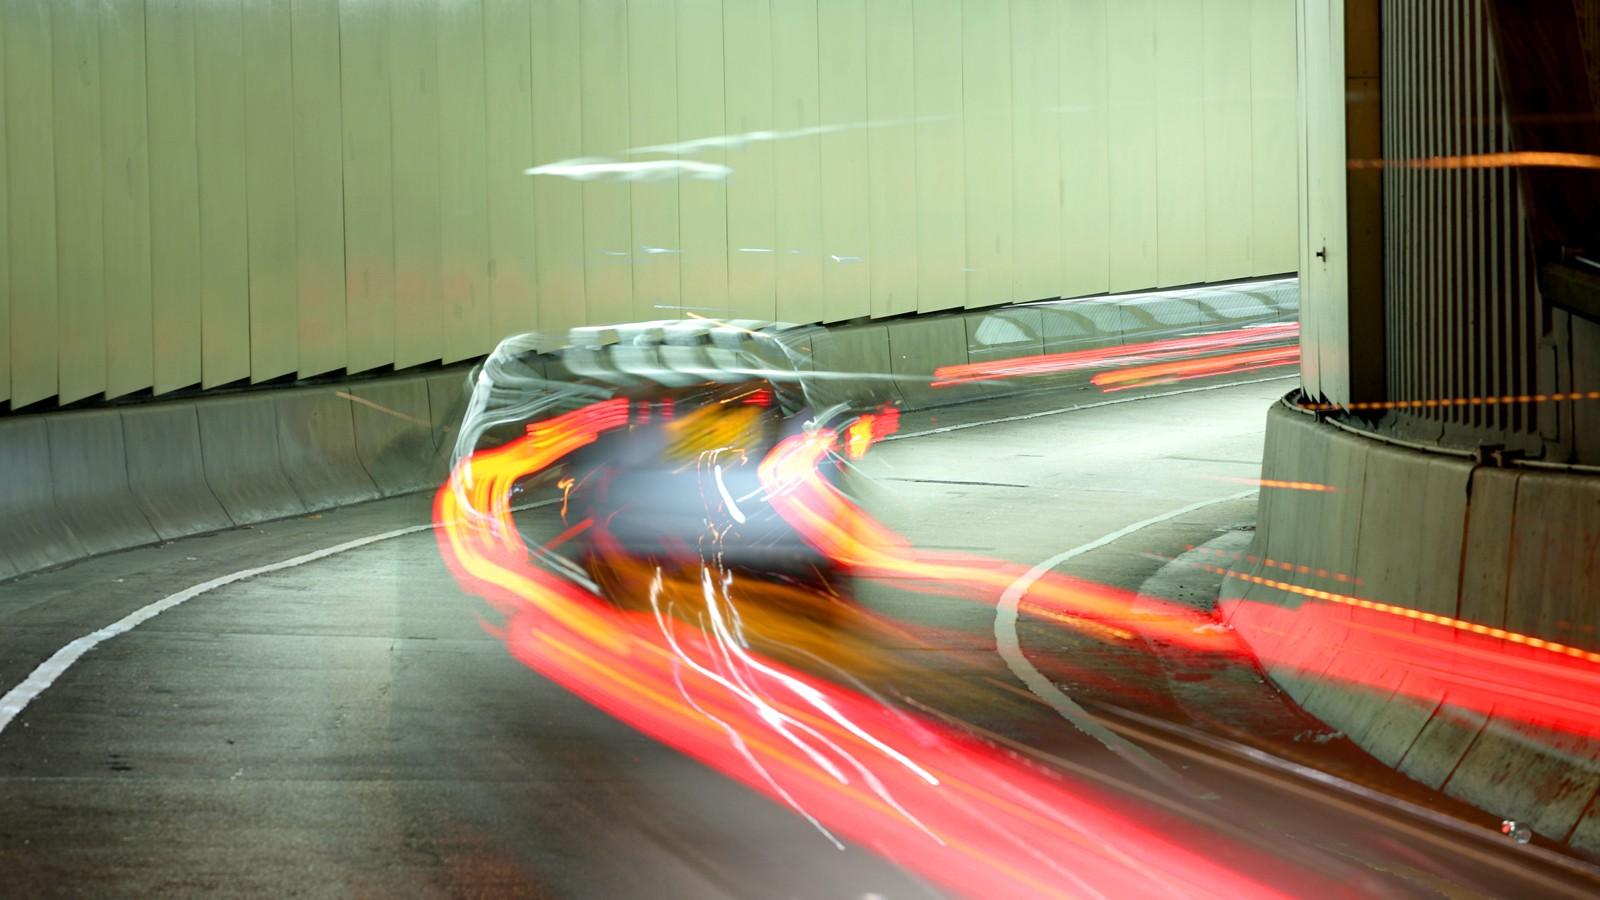 street racing car blurred background